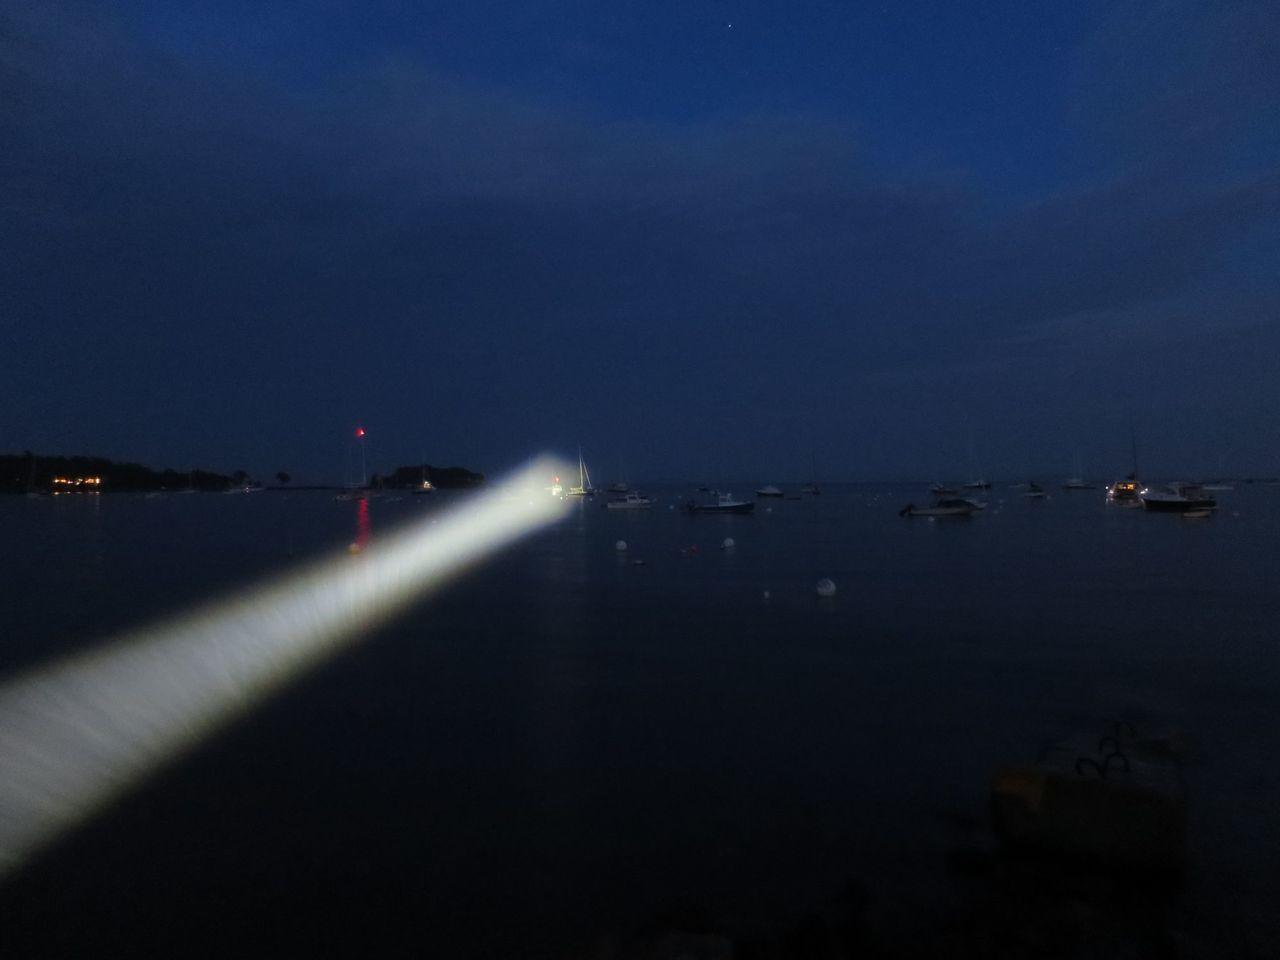 Marinebeam_Ultra_spot_flashlight_testing_cPanbo__13764.1422483436.jpg